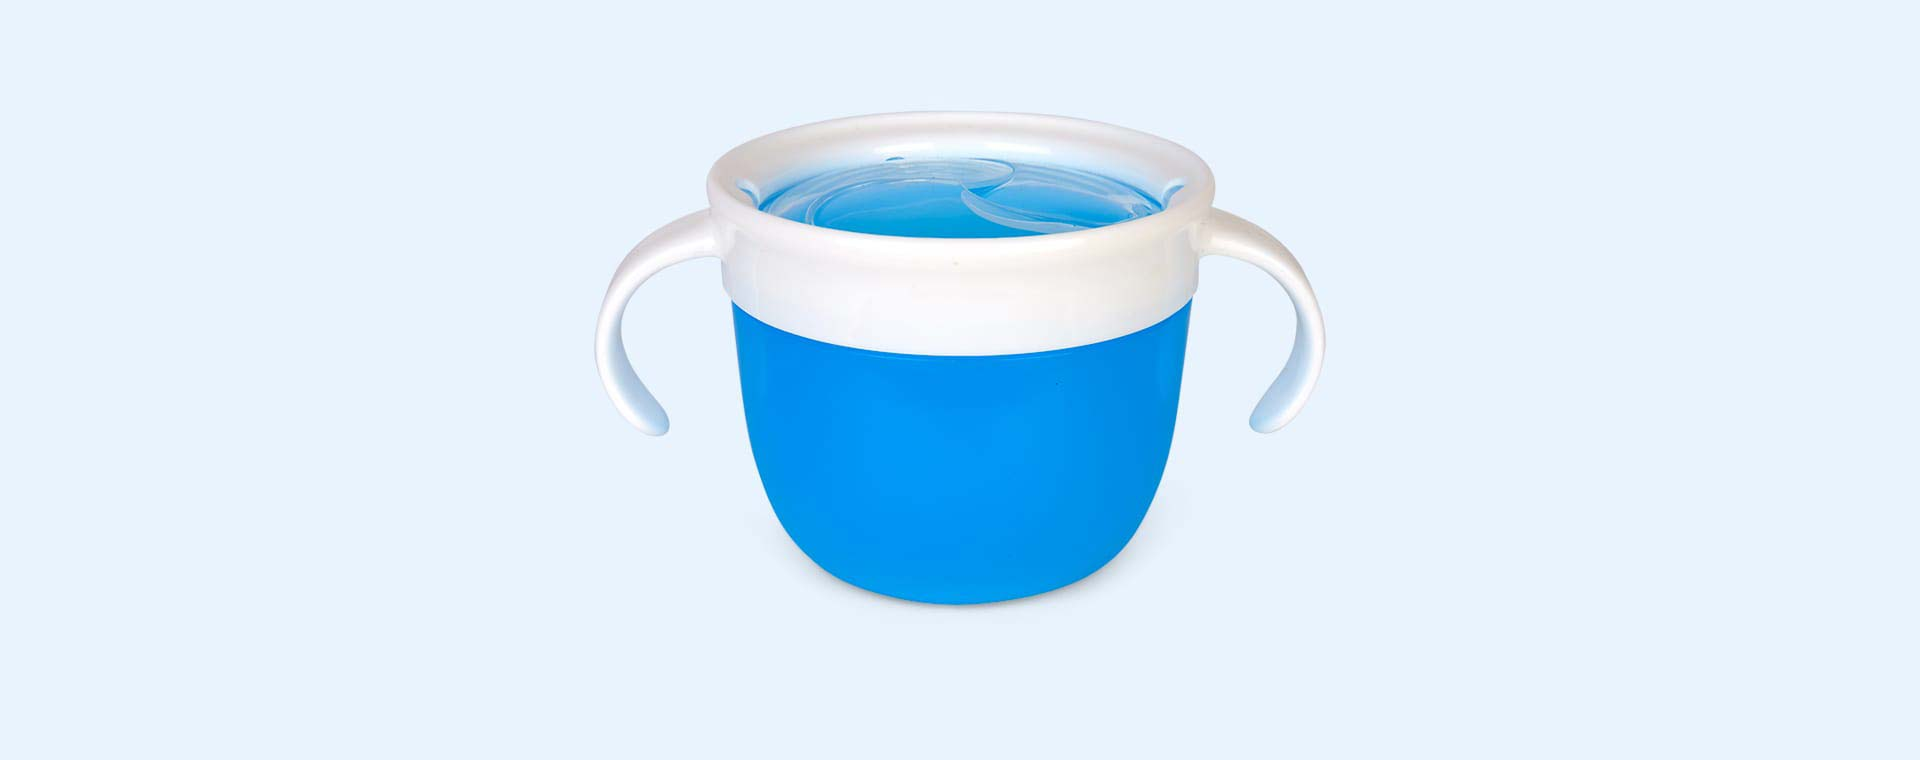 Blue Munchkin Click Lock Deluxe Snack Catcher